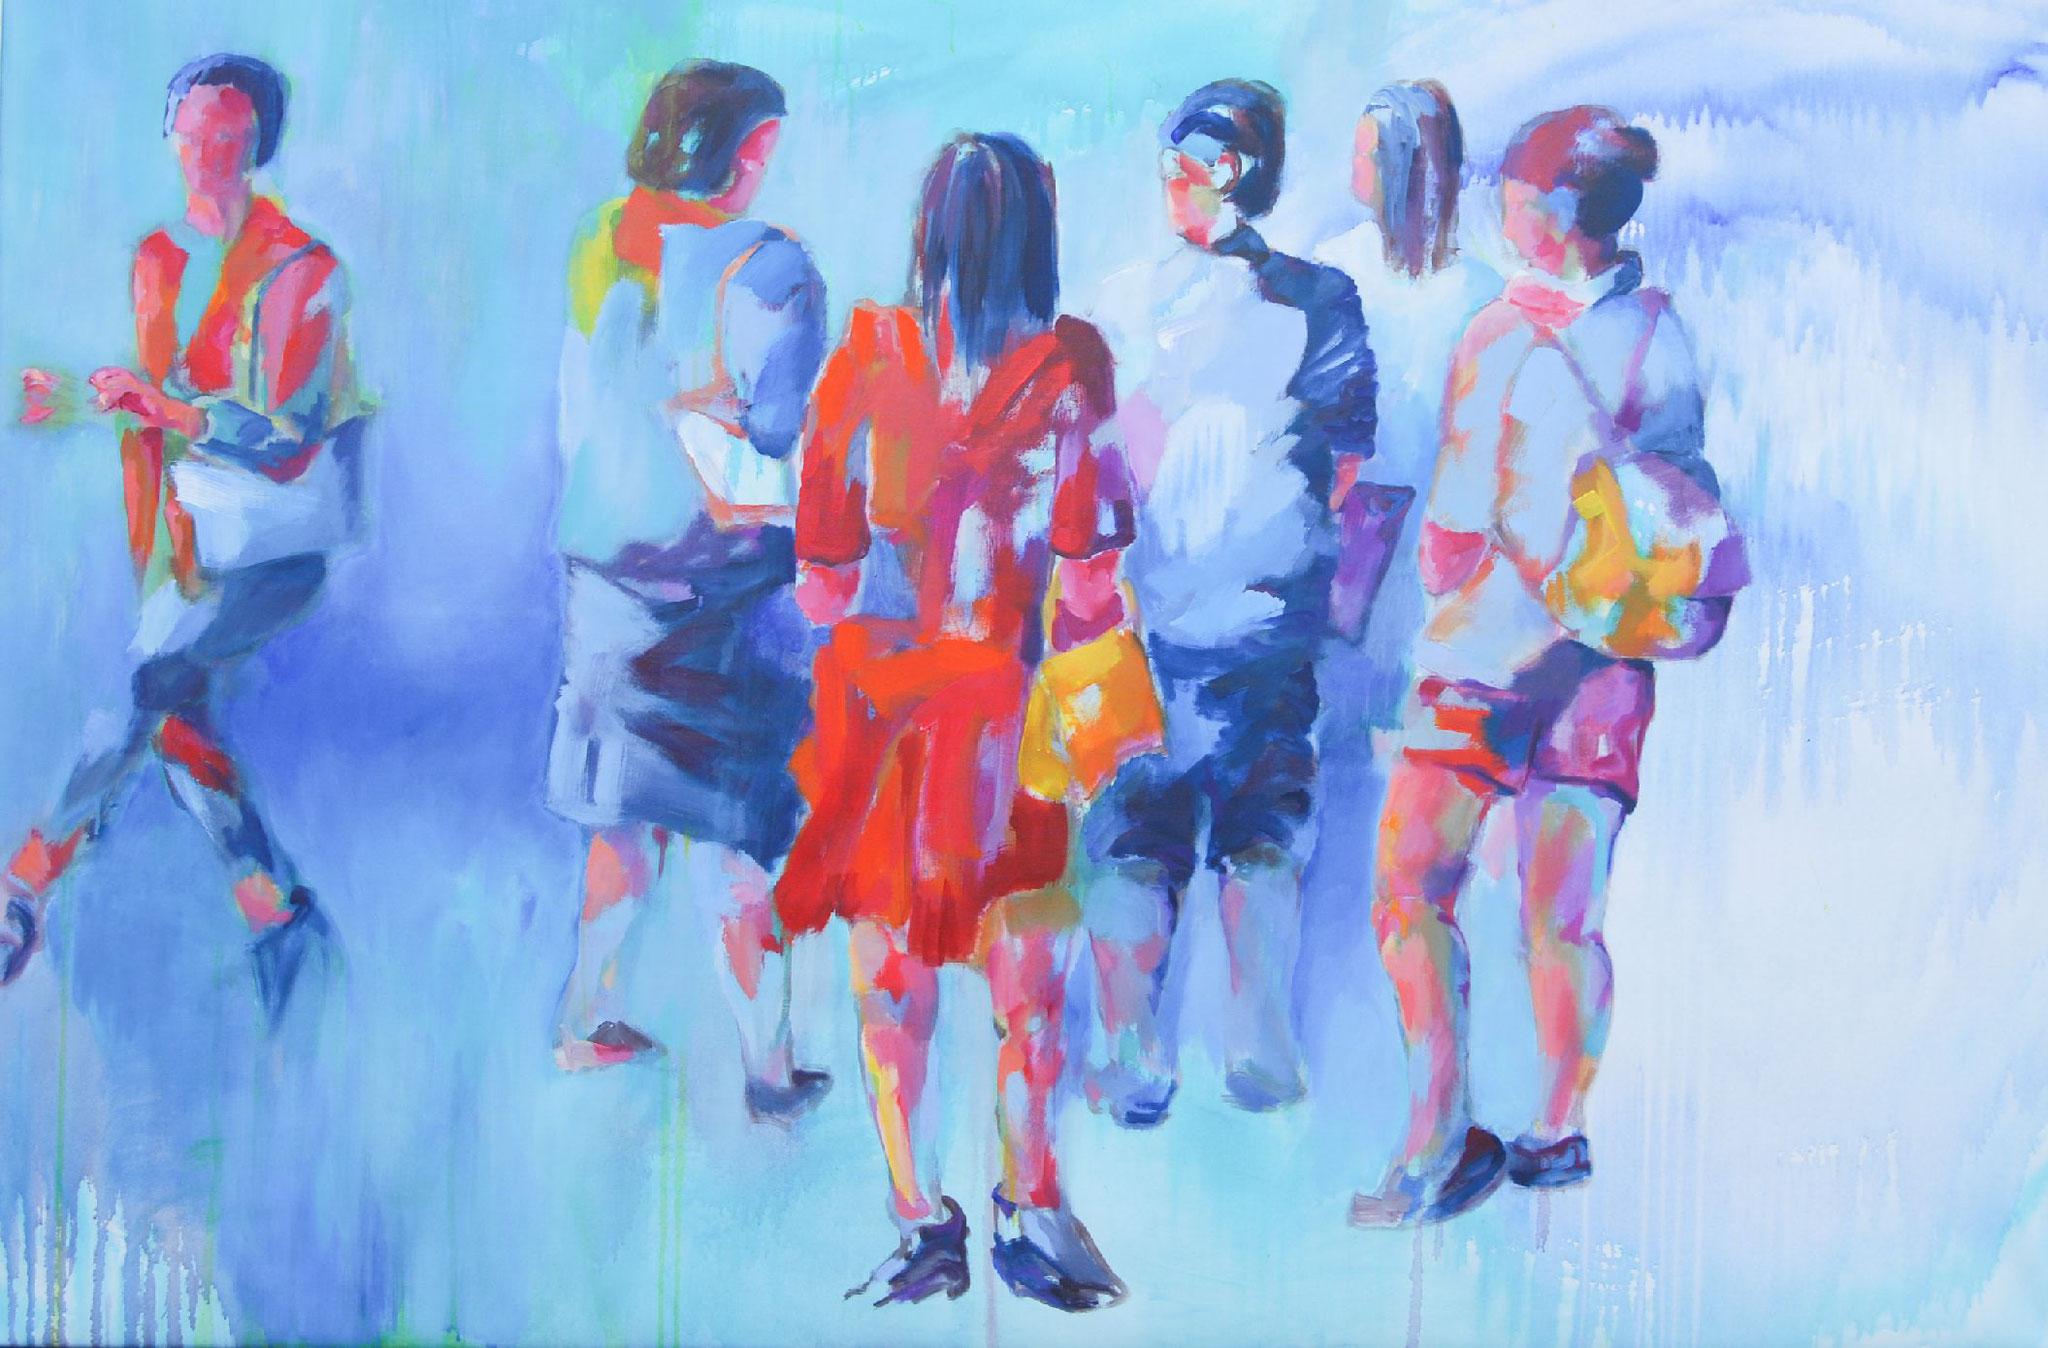 Besucher 14.1, 2014, Acryl auf Leinwand, 119 x 180 cm